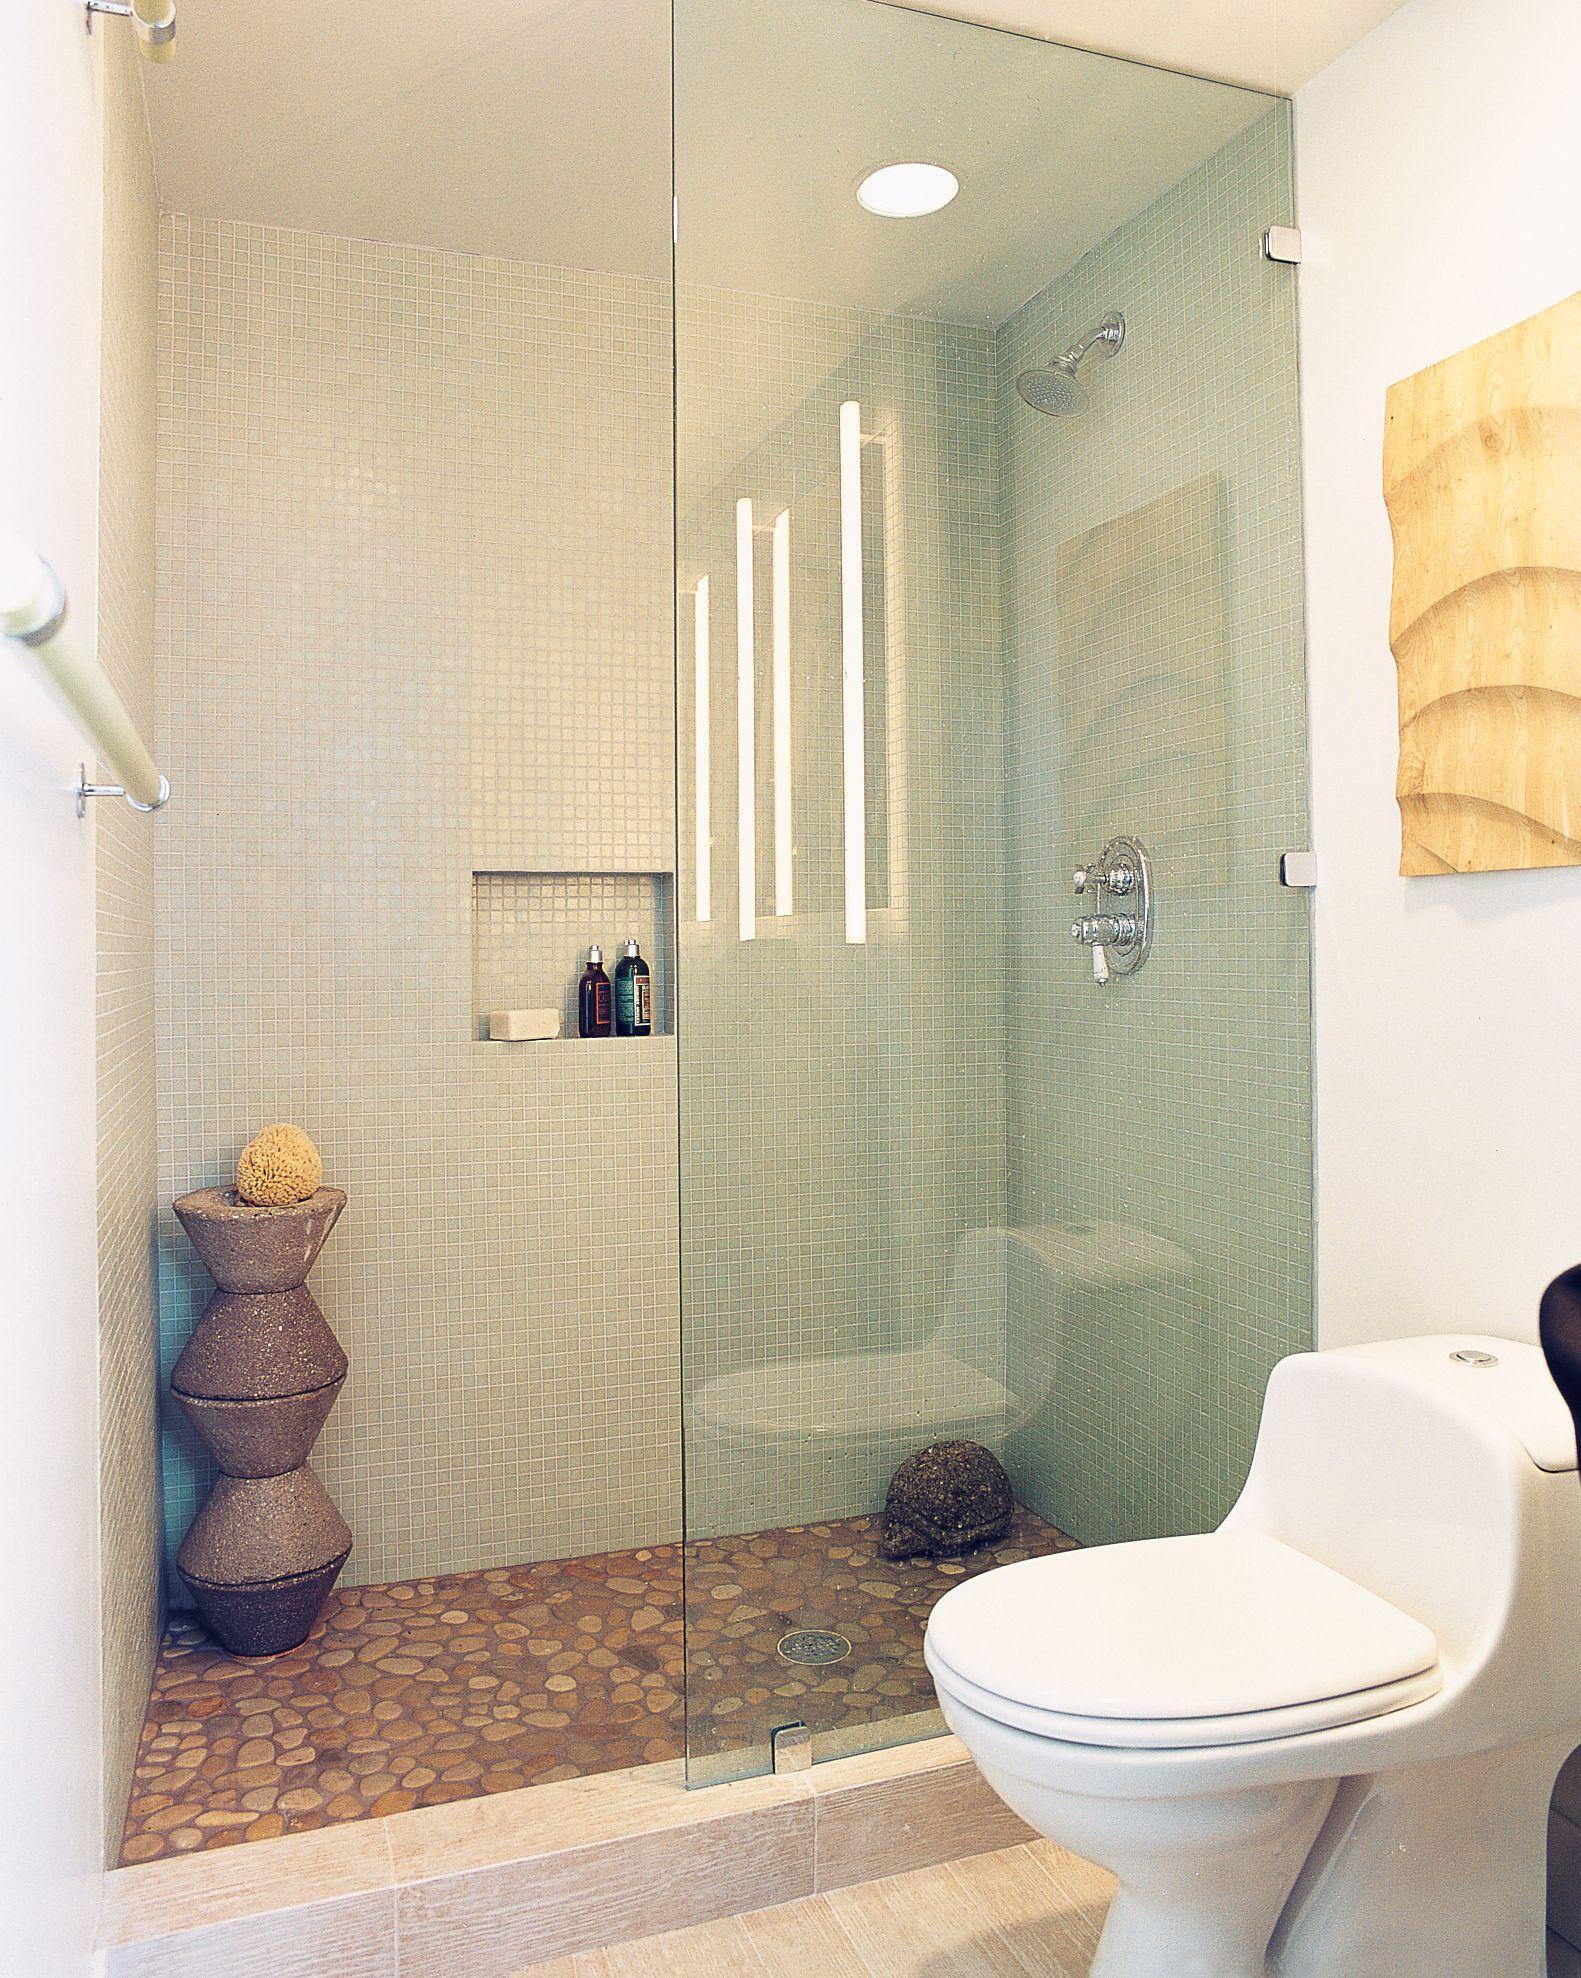 bathing beauties the simple ideas behind 2 stylish on bathroom renovation ideas nz id=46026